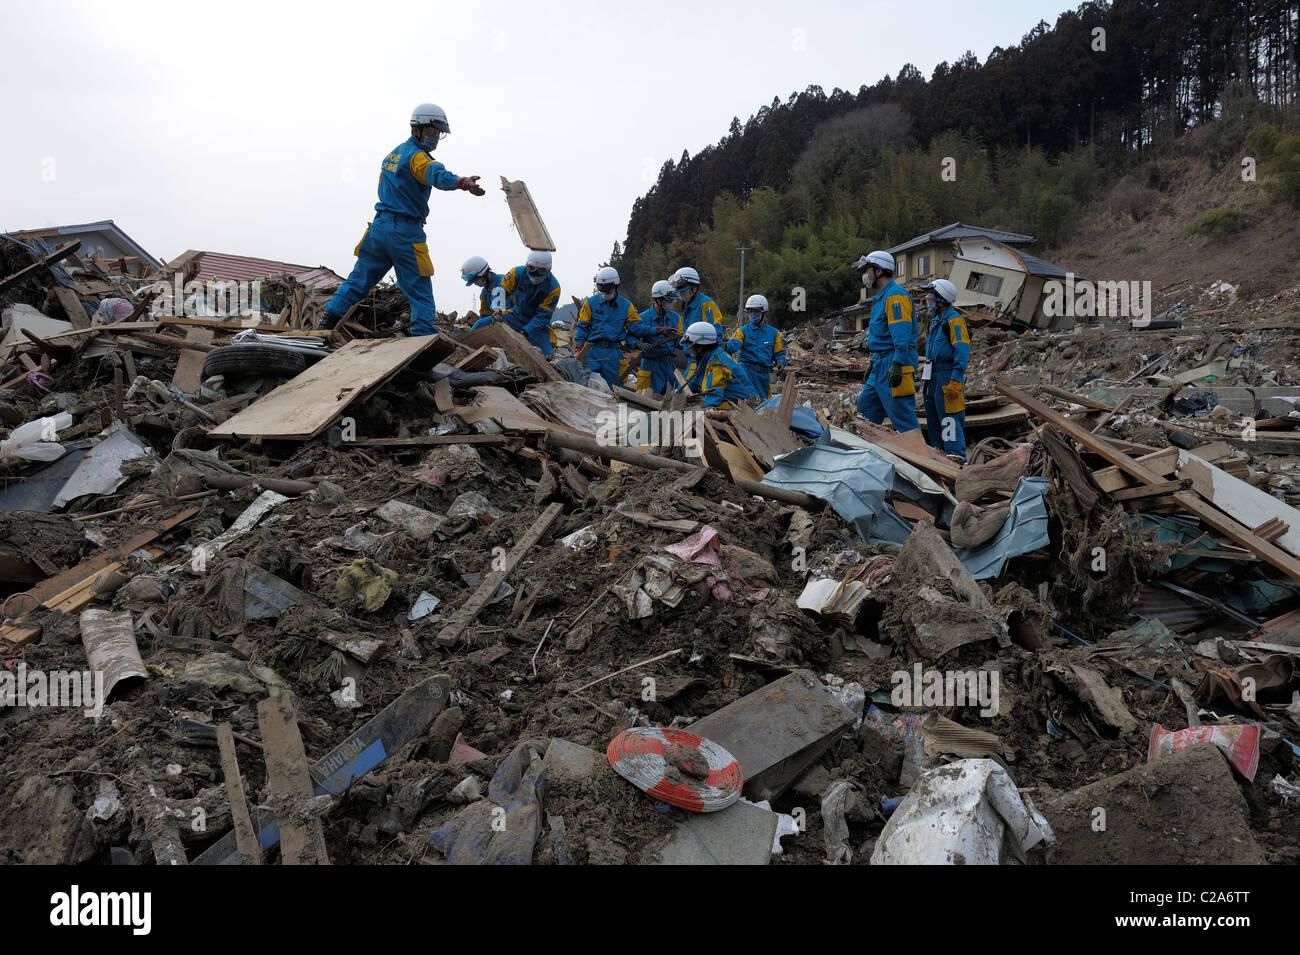 Great East Japan Earthquake And Tsunami Stock Photos Amp Great East Japan Earthquake And Tsunami